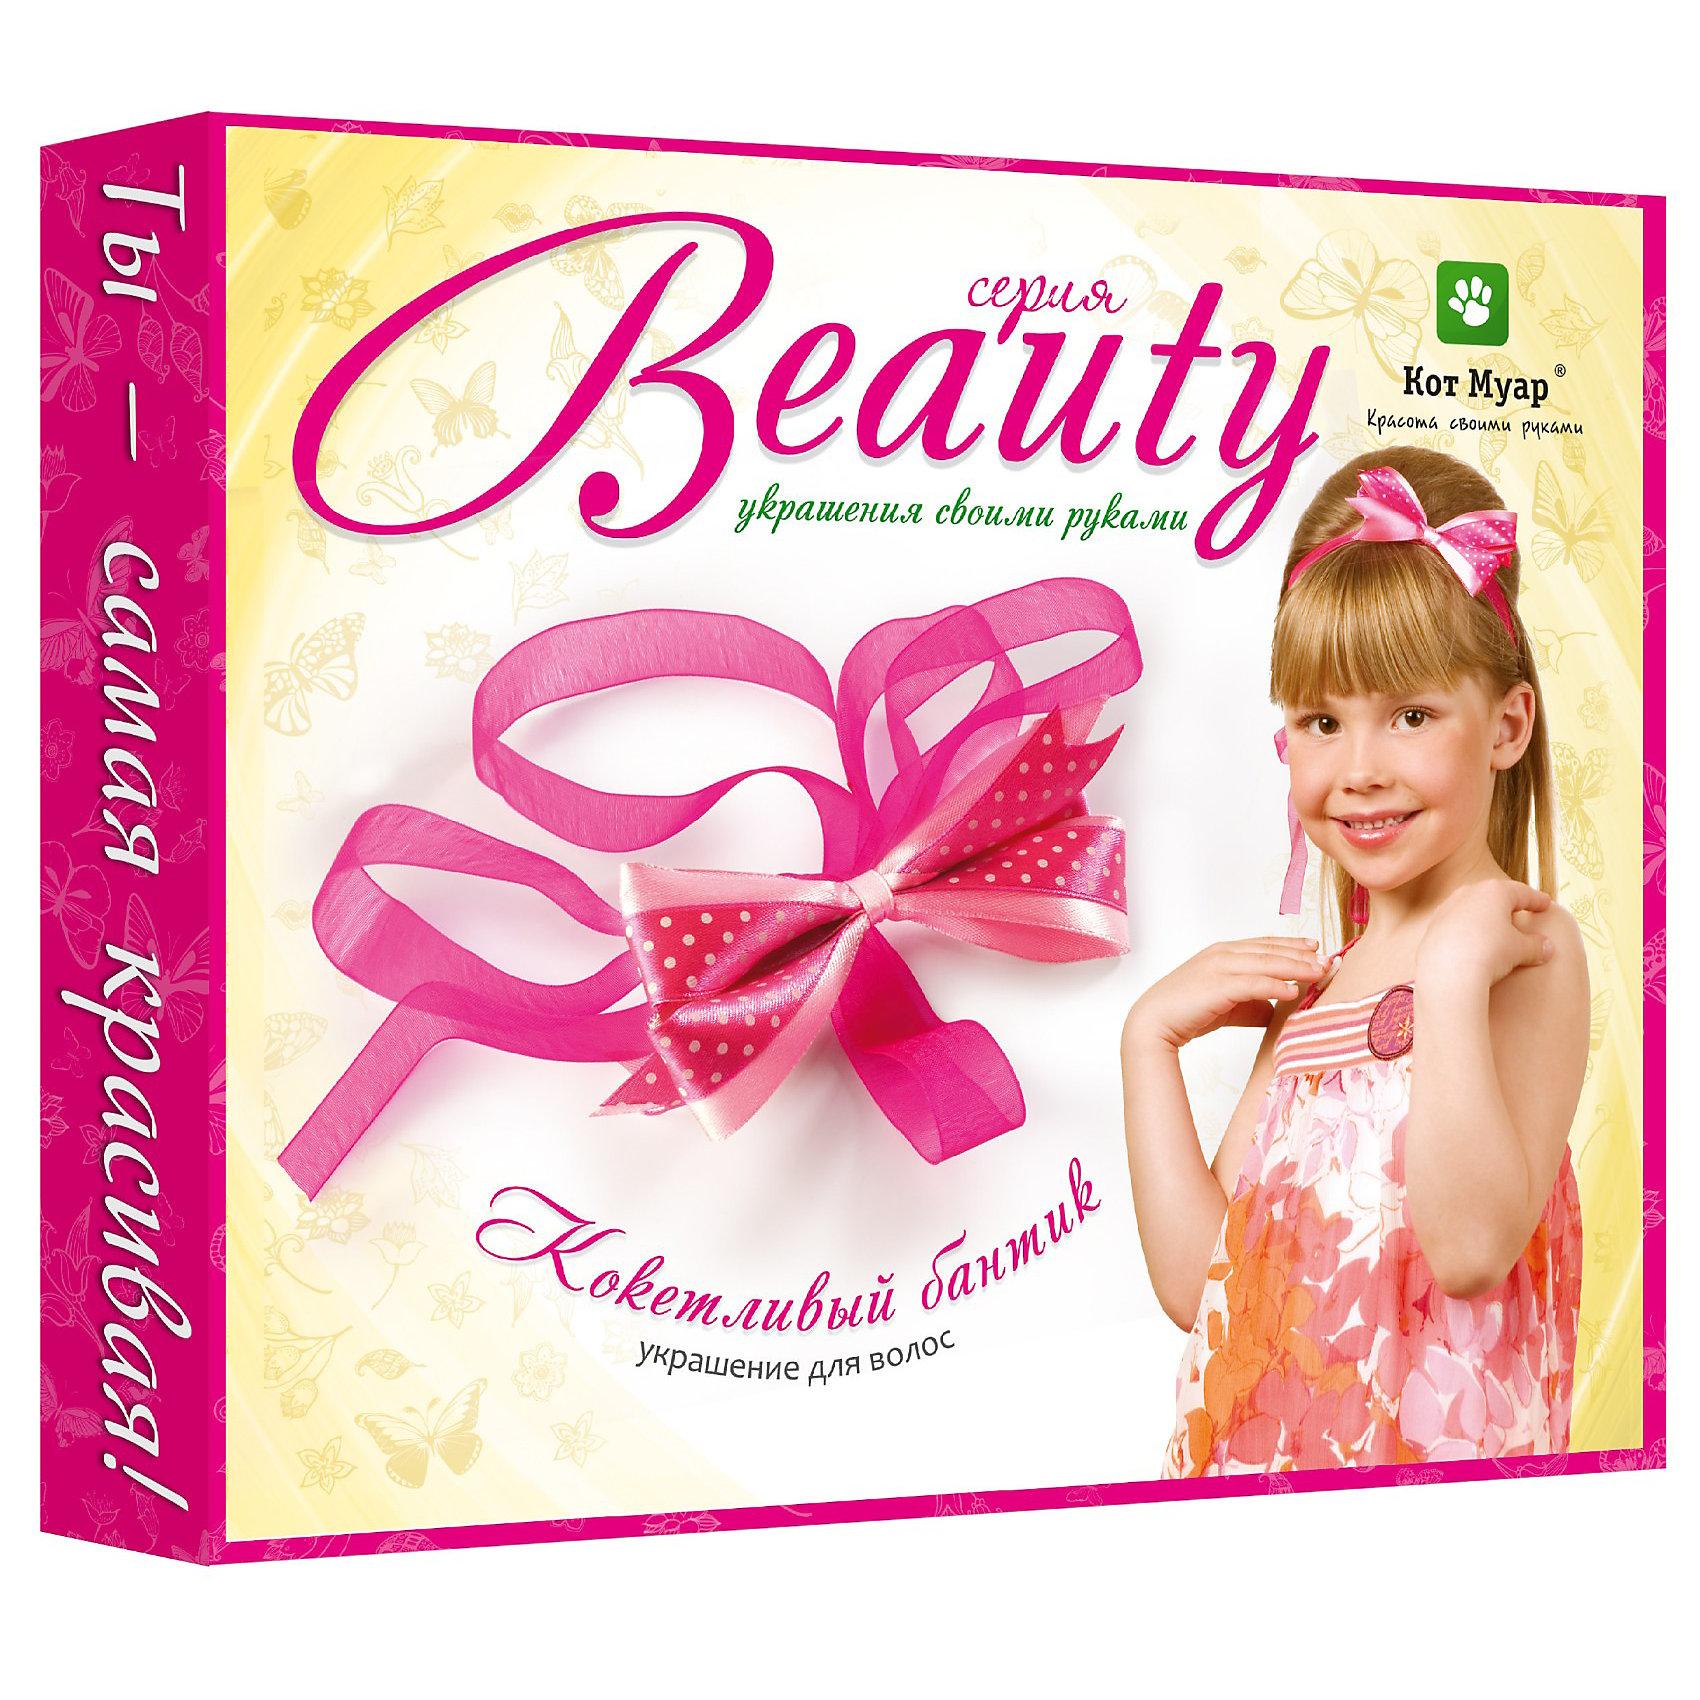 ���������� ������, ����� Beauty, ��� ��������� BEAUTY- ��������� ����, ��� �������� ������ ������ �������� � ������ ���������. ������ ��������� ������� ������ ������� ���-�� ��� ����, ���� �� �����, ��������� ��� ������ ���������.<br>� ������ �� ������� ��� ����������� ��� �������� ���������, � ��� �� ��������� ���������� � ����������! � ������: �����, ������, ����� ��������, ����� ����������, ���� �������, ������ ��� �����, ������, ������� ��� �����, ��������� ��� �����, ��������� ��� �����, �����, �������������� ����������, ��������� ����������. � ������������ � �����������.<br><br>������ ��: 210<br>������� ��: 180<br>������ ��: 30<br>��� �: 100<br>������� �� �������: 72<br>������� �� �������: 1188<br>���: �������<br>�������: �������